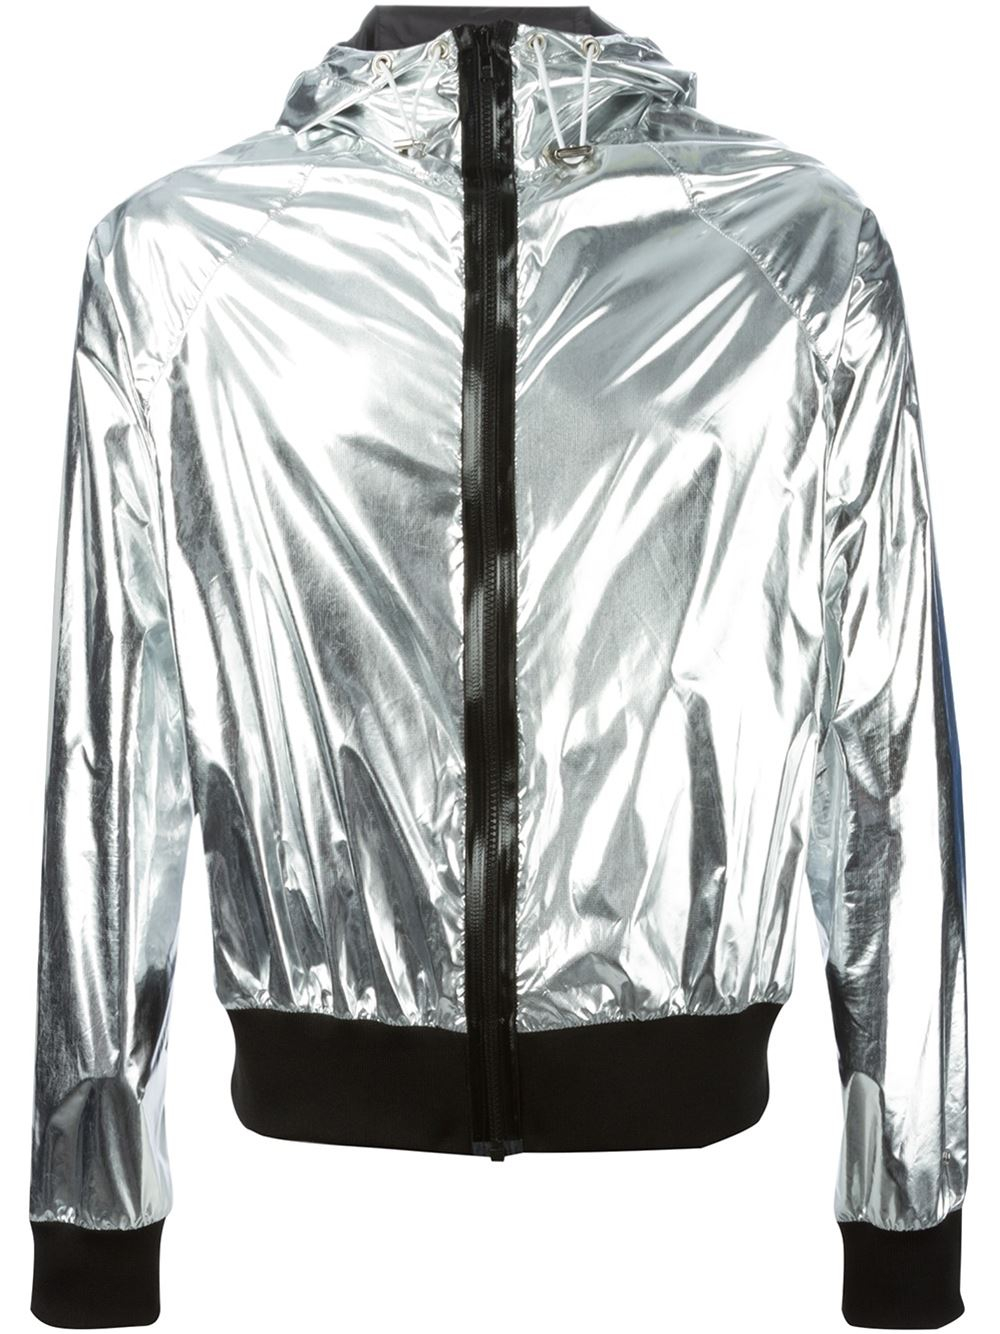 Wanda Nylon Metallic Hooded Bomber Jacket In Silver For